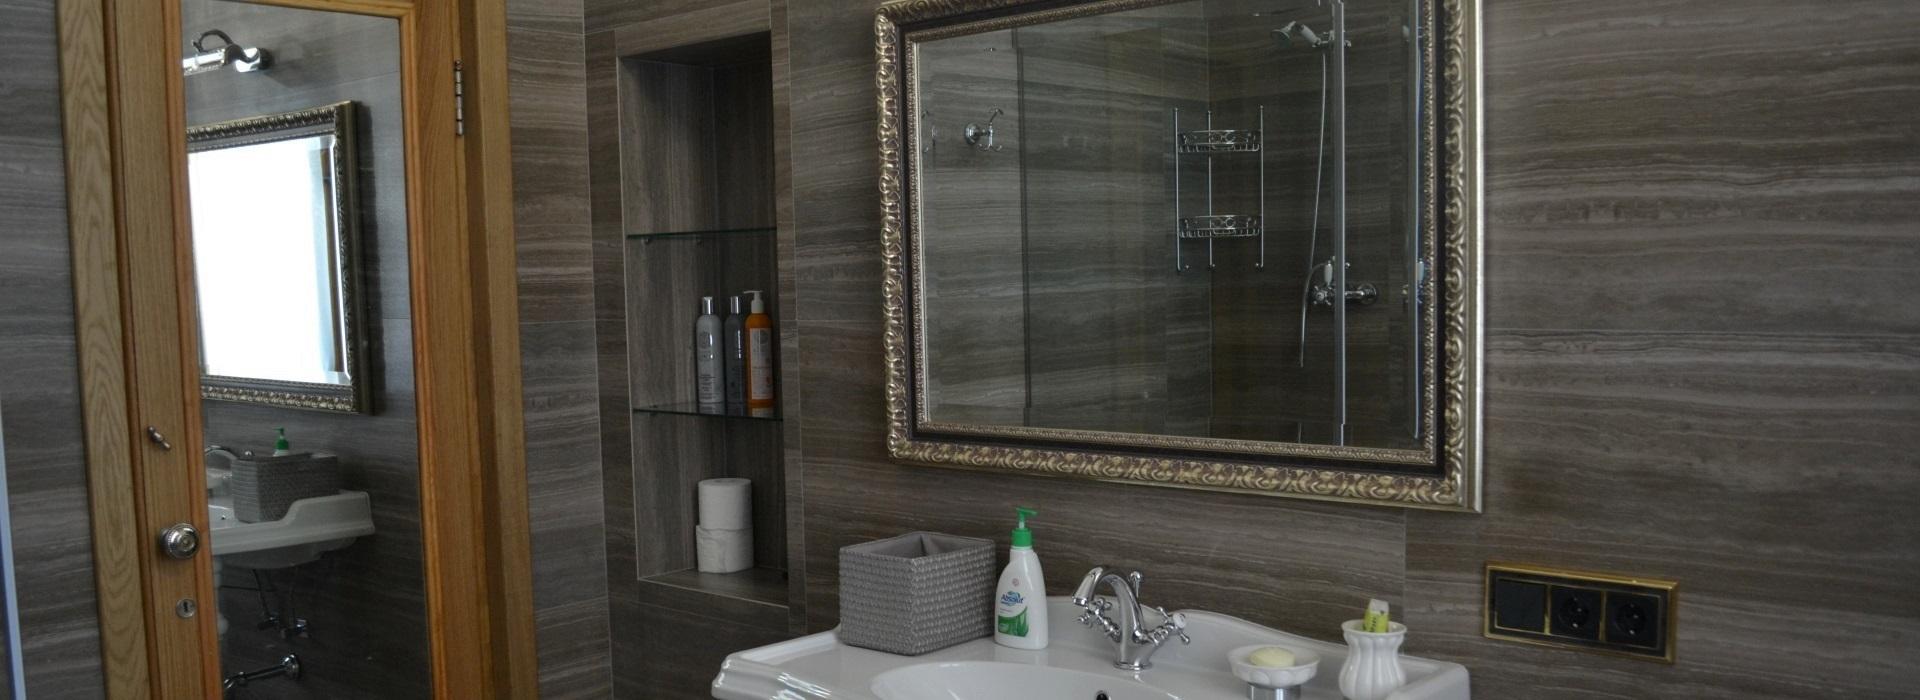 Стёкла и зеркала в интерьере